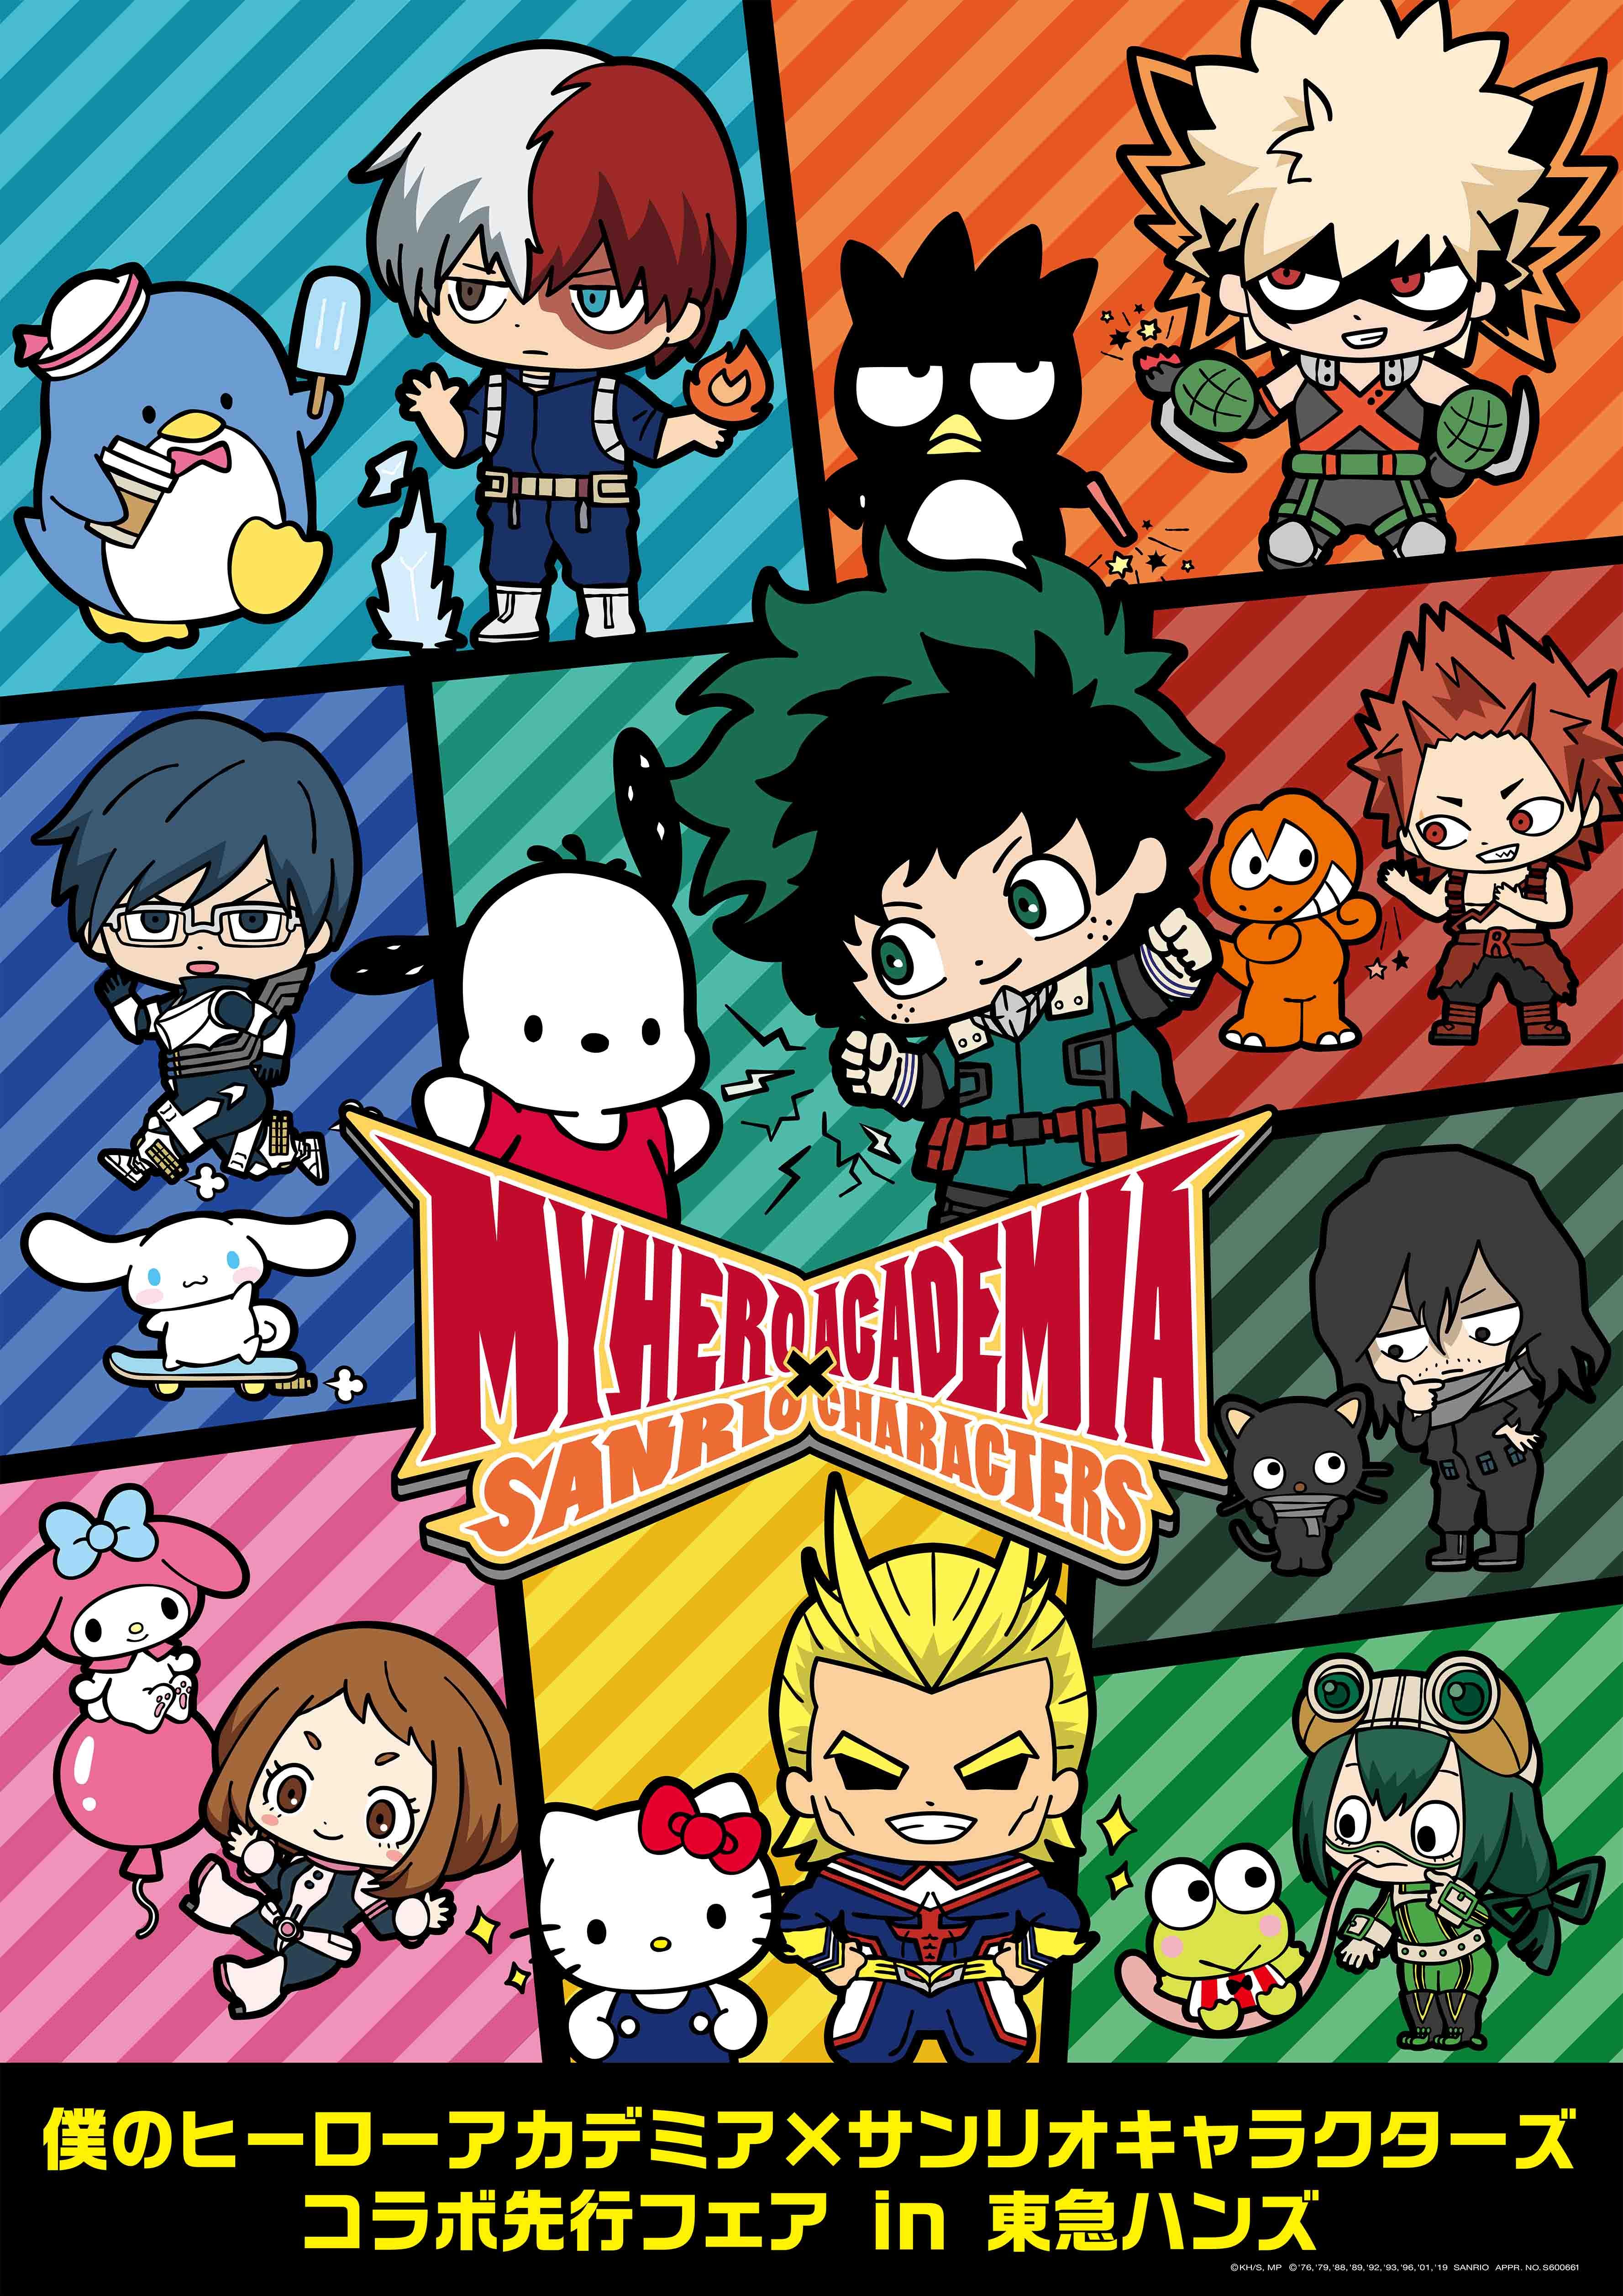 My Hero Academia Characters Get An Adorable Sanrio Partner